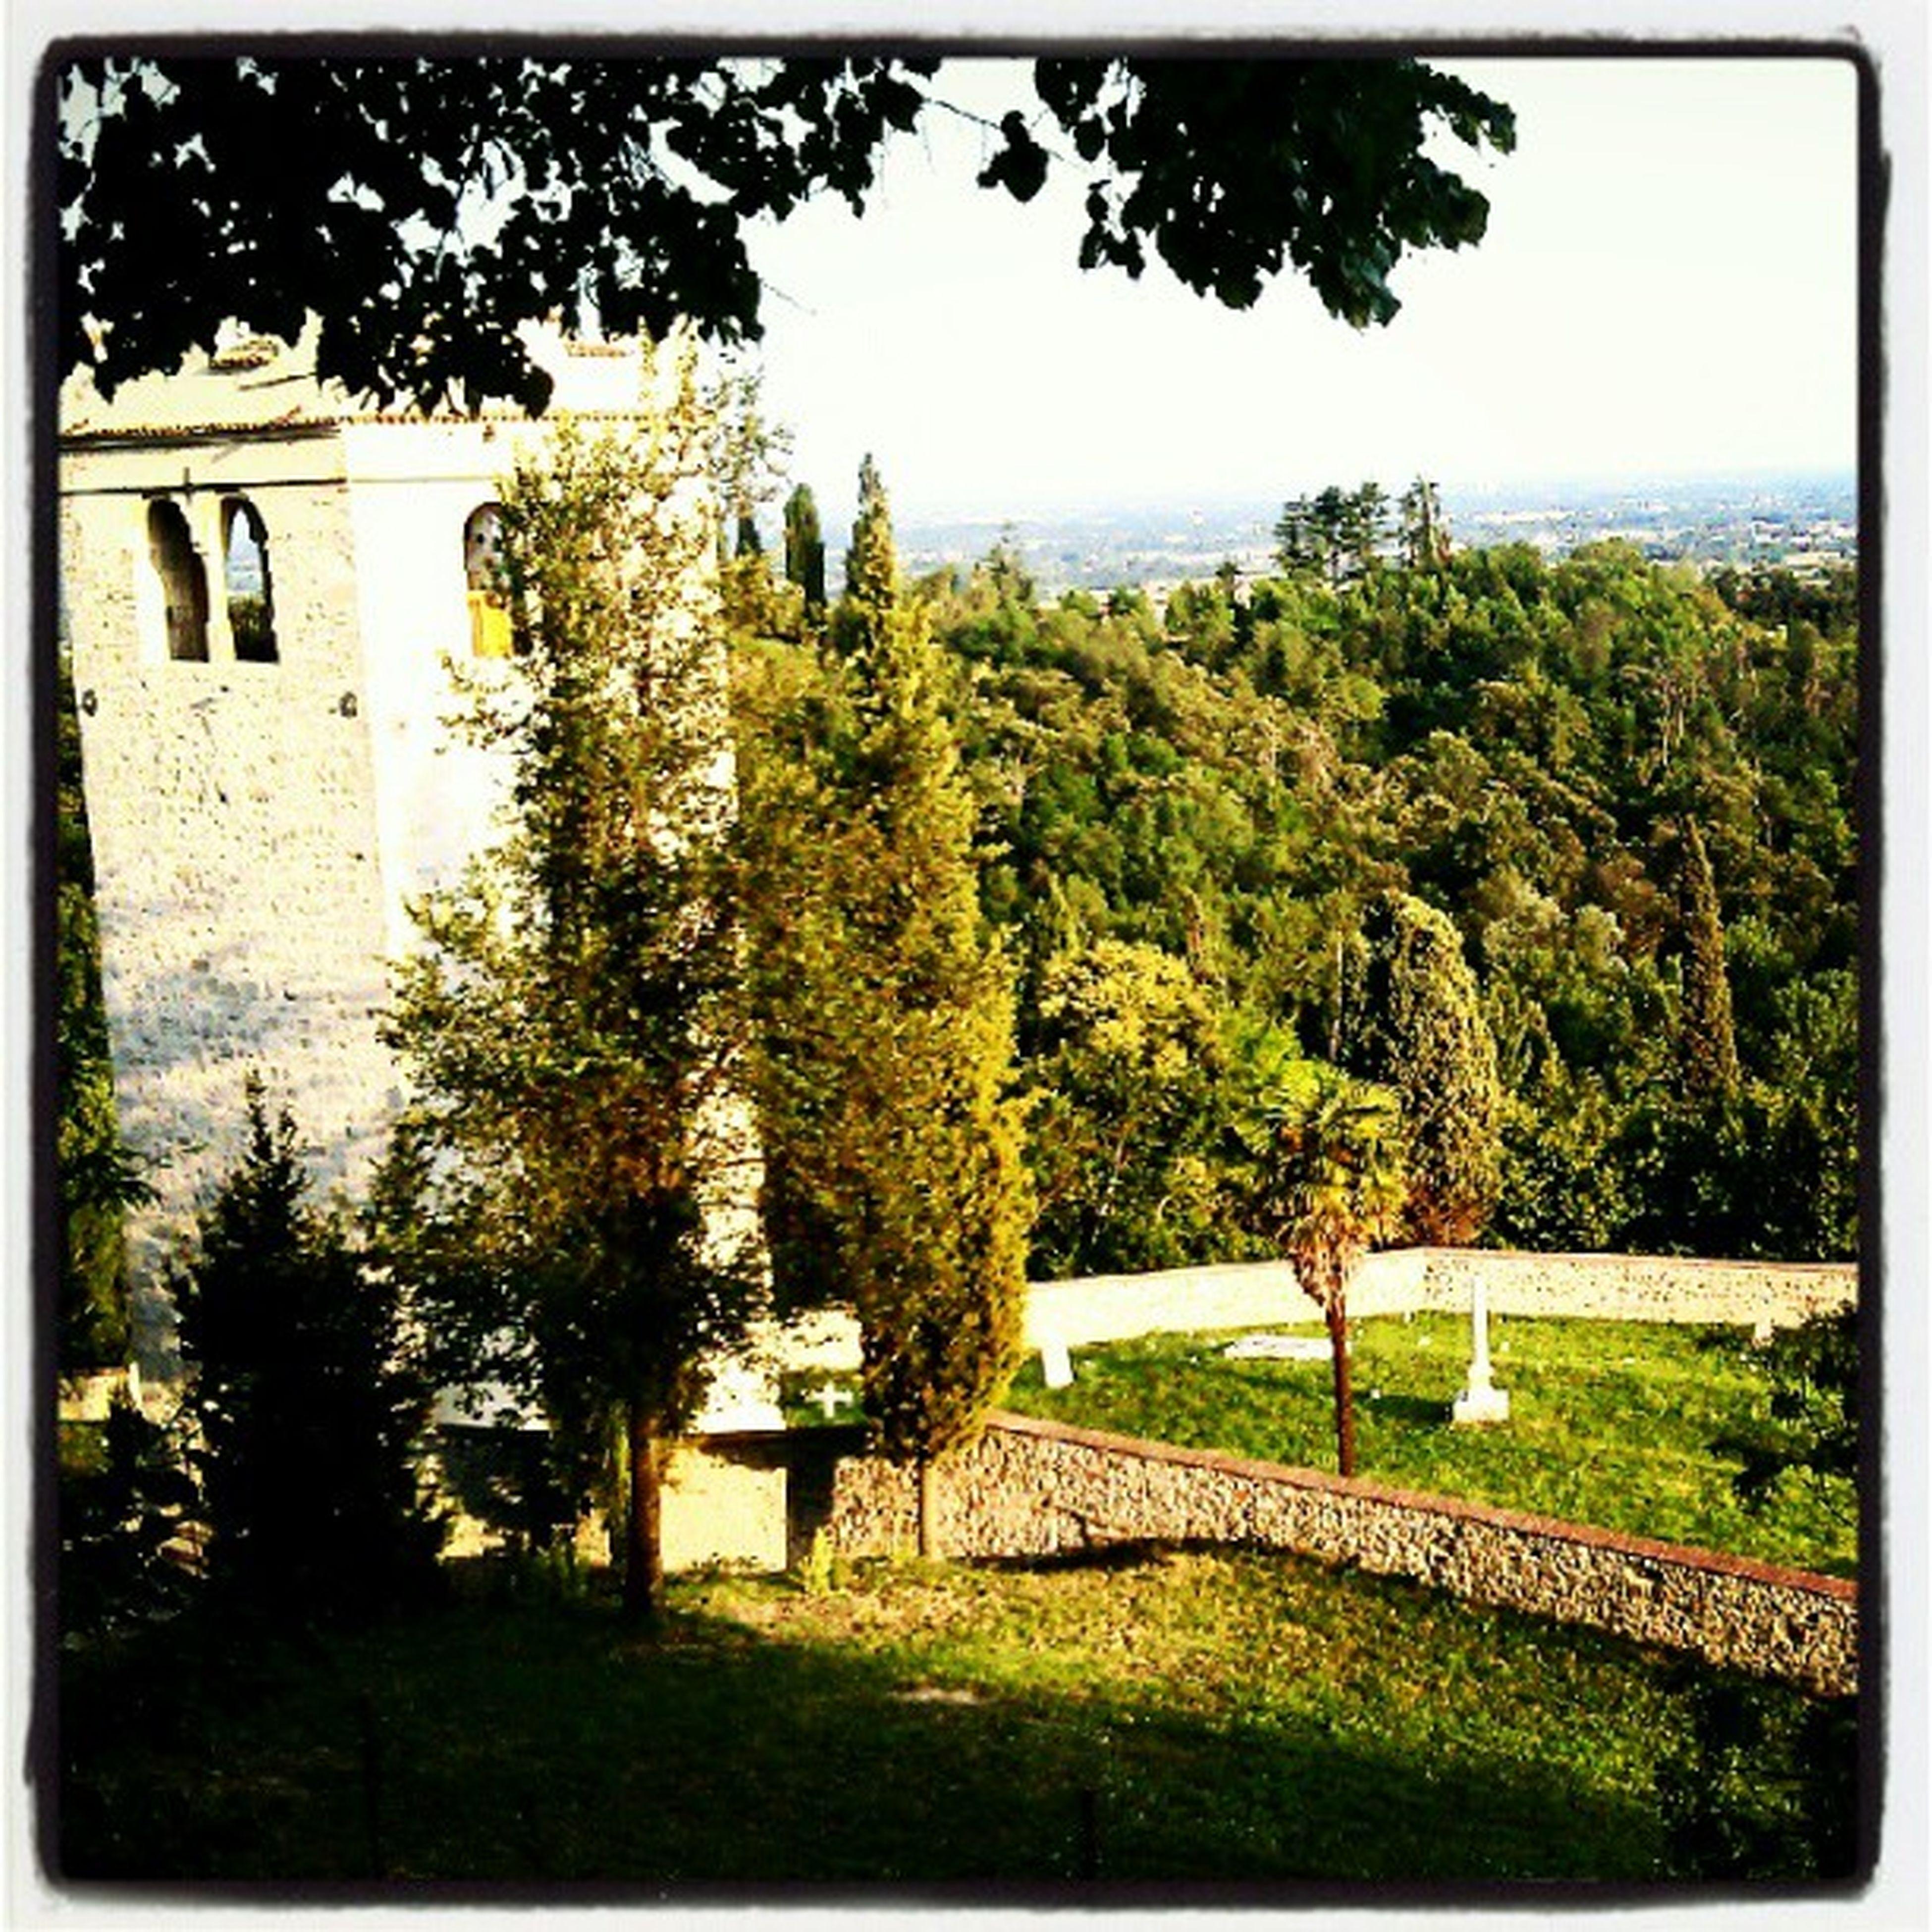 Home . Hobisognodivacanze Tantobisogno Instamood instamoment castle tower graveyard ezzelinodaromano ezzelini history oldtimes onceuponatime igers igersitalia veneto Treviso stufodimetterehashtag unknown